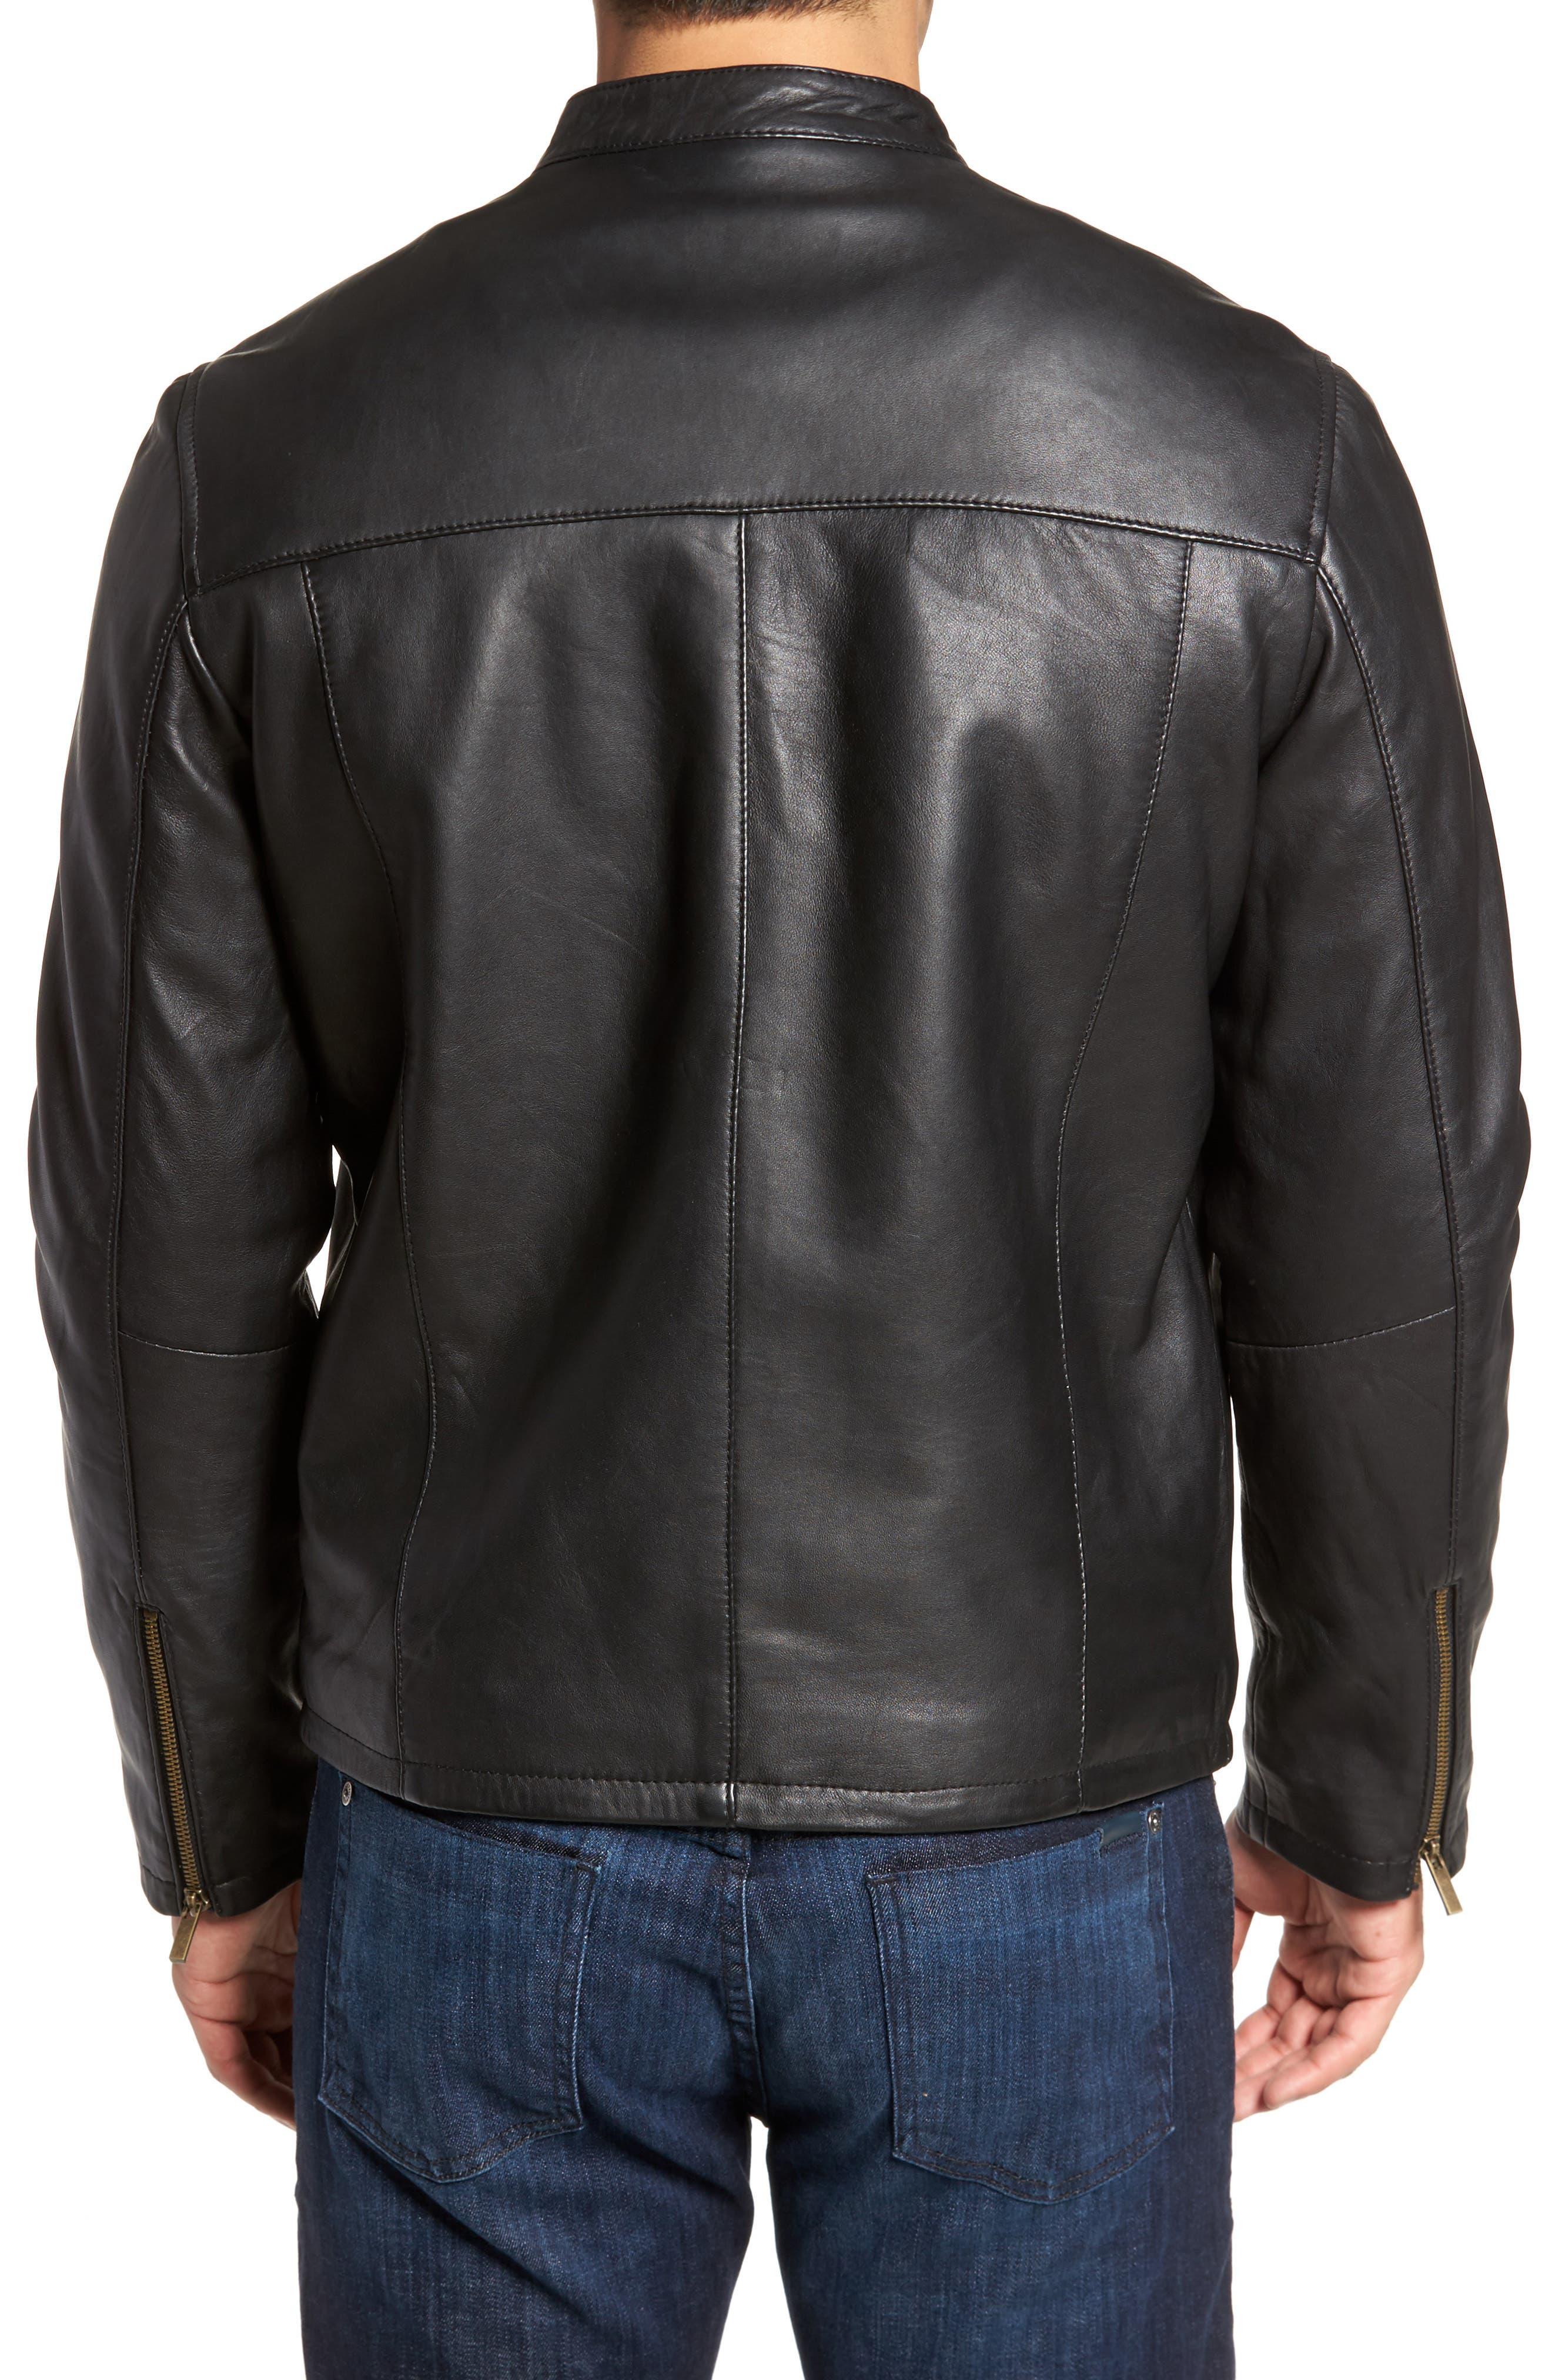 COLE HAAN, Lambskin Leather Moto Jacket, Alternate thumbnail 2, color, 001